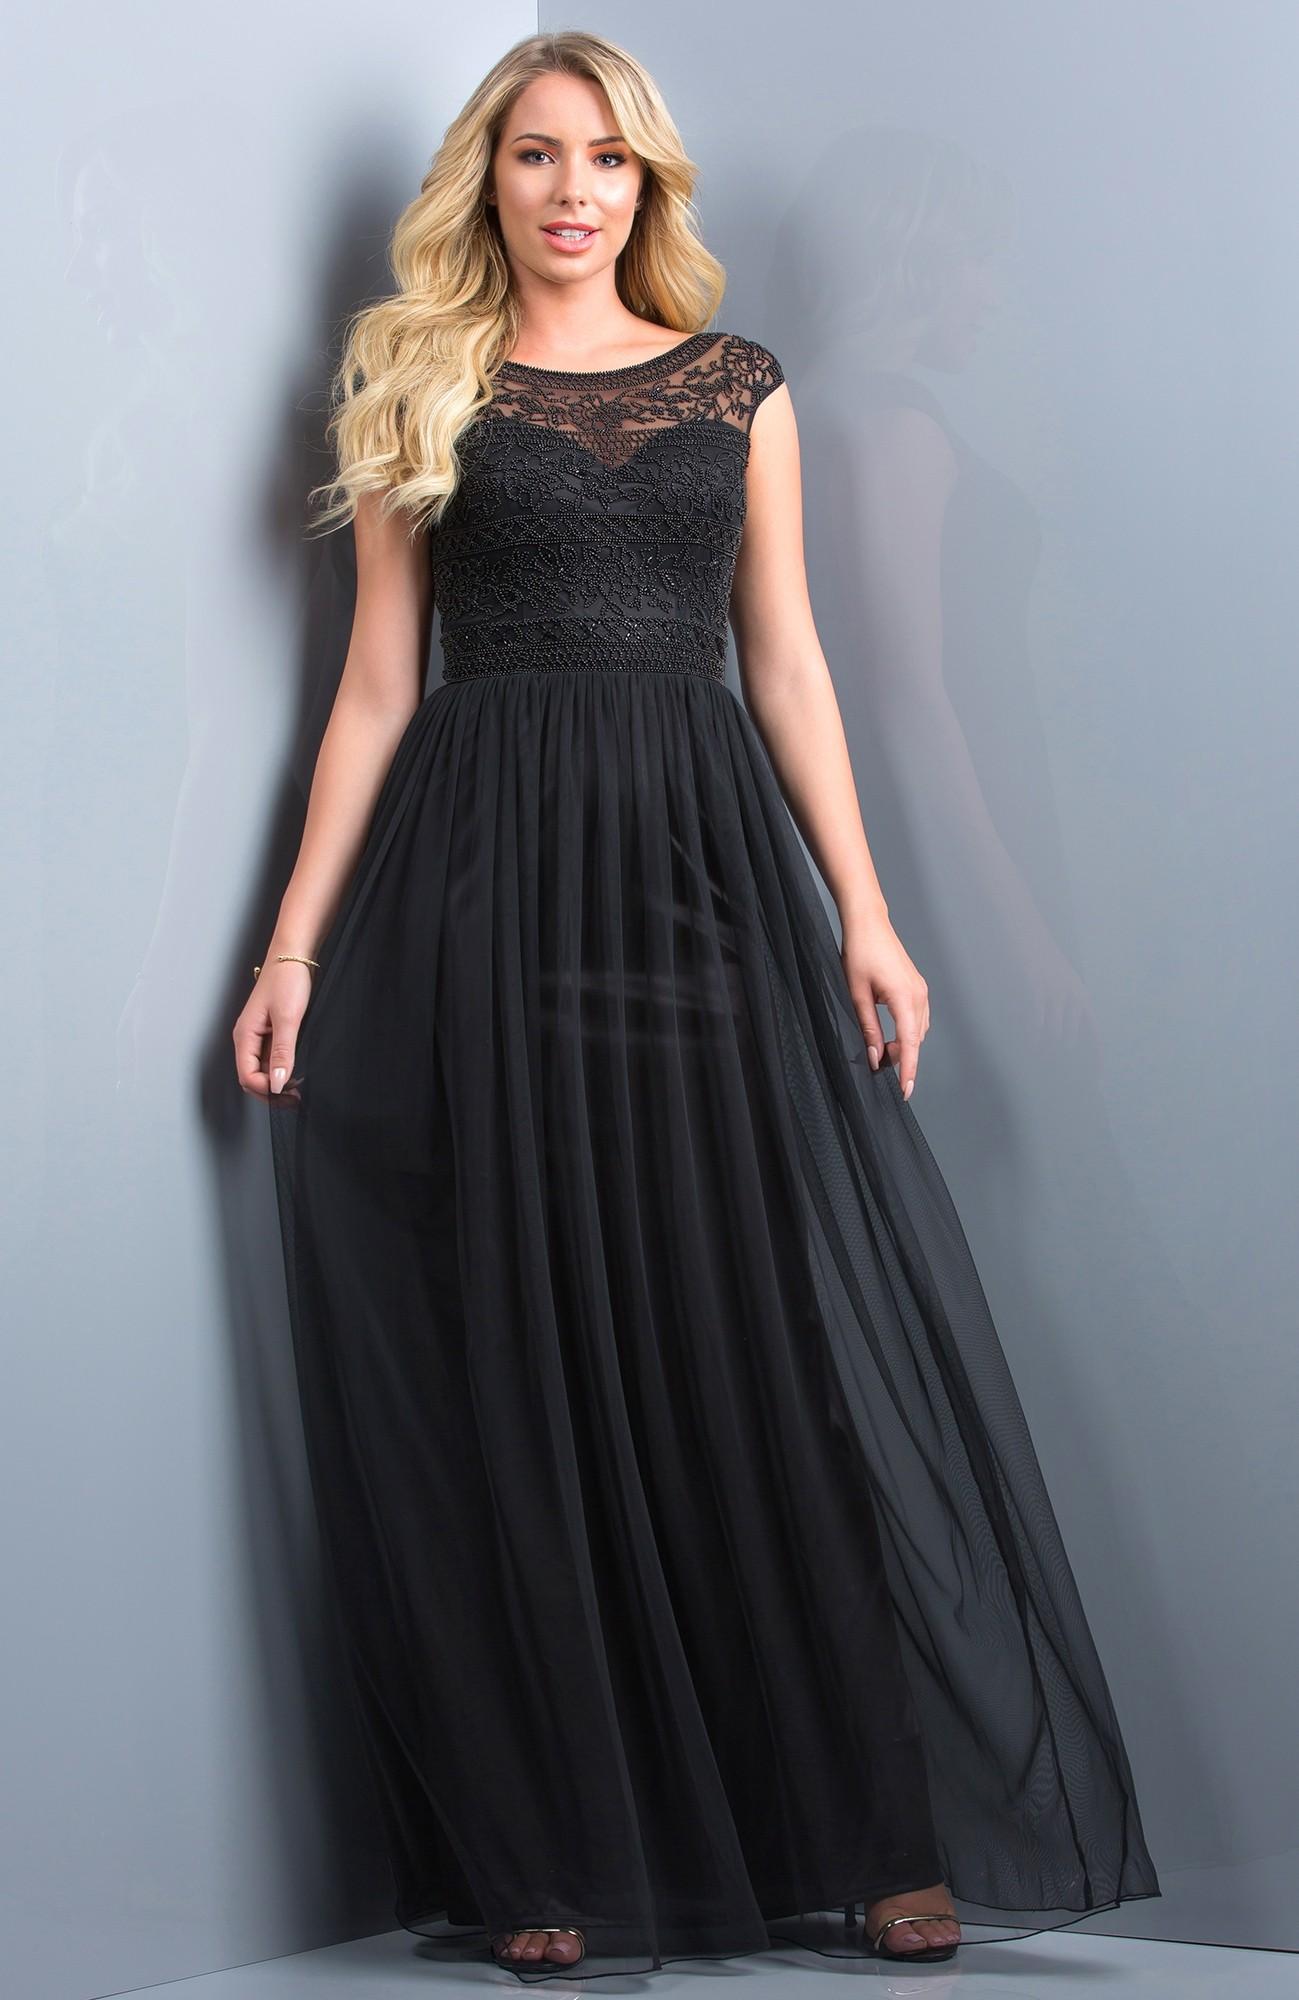 Scala 48821 Off the Shoulder Illusion Princess Dress | RissyRoos.com